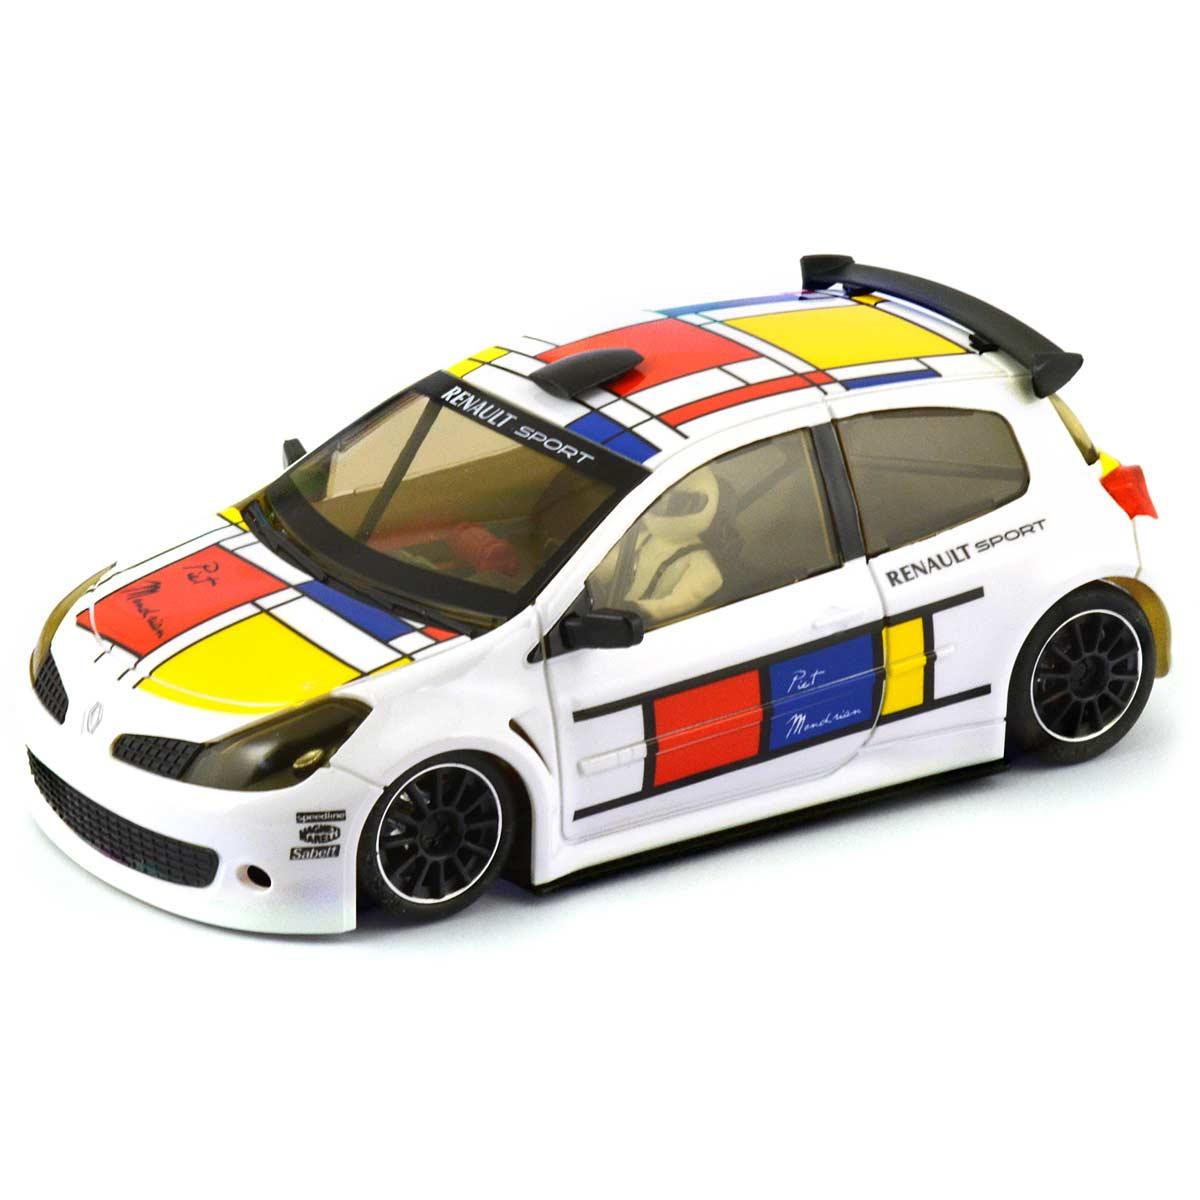 Renault Sport: NSR Renault Clio Sport Piet Mondrian Edition (NSR-0009